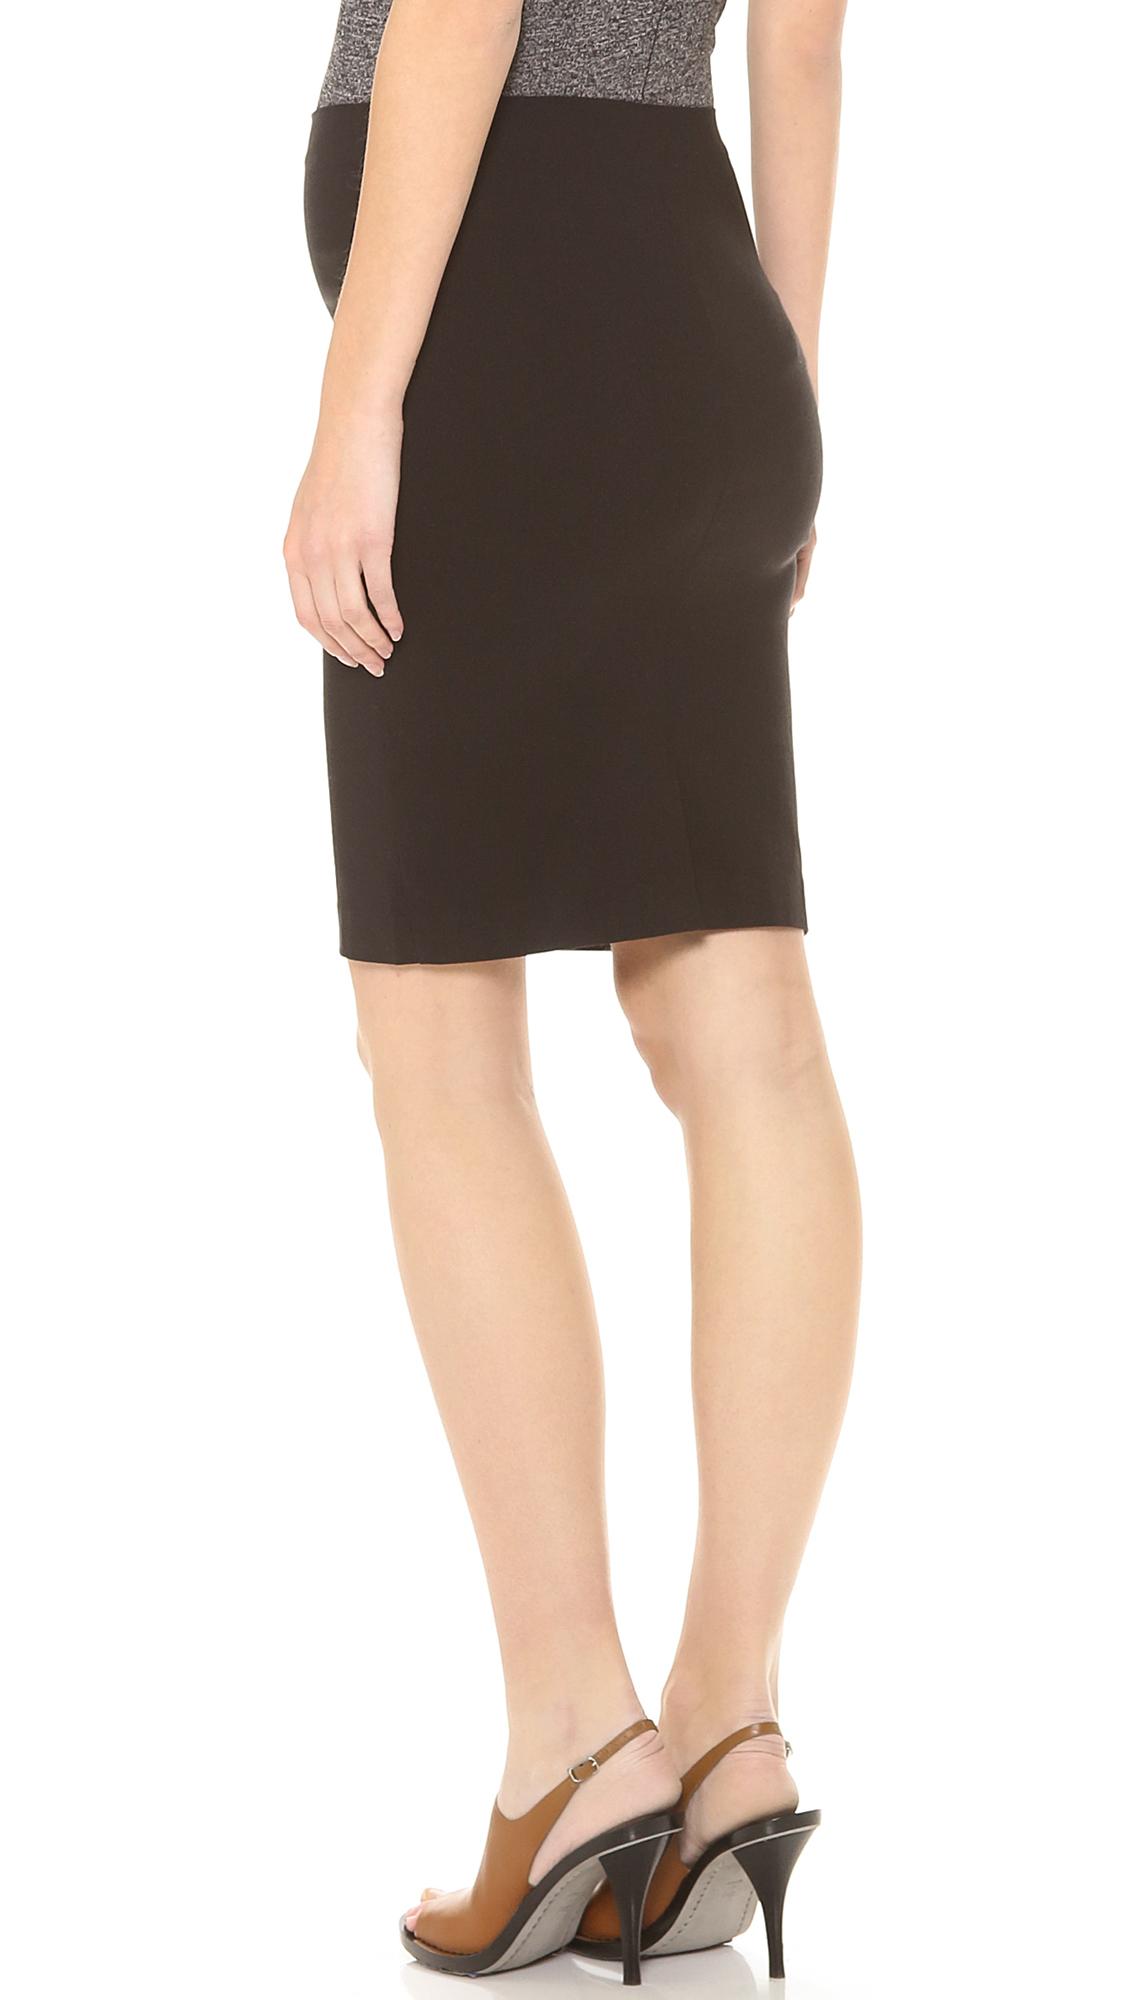 d3cb2f3a1275b Lyst - Rosie Pope Pret Maternity Skirt - Black in Black